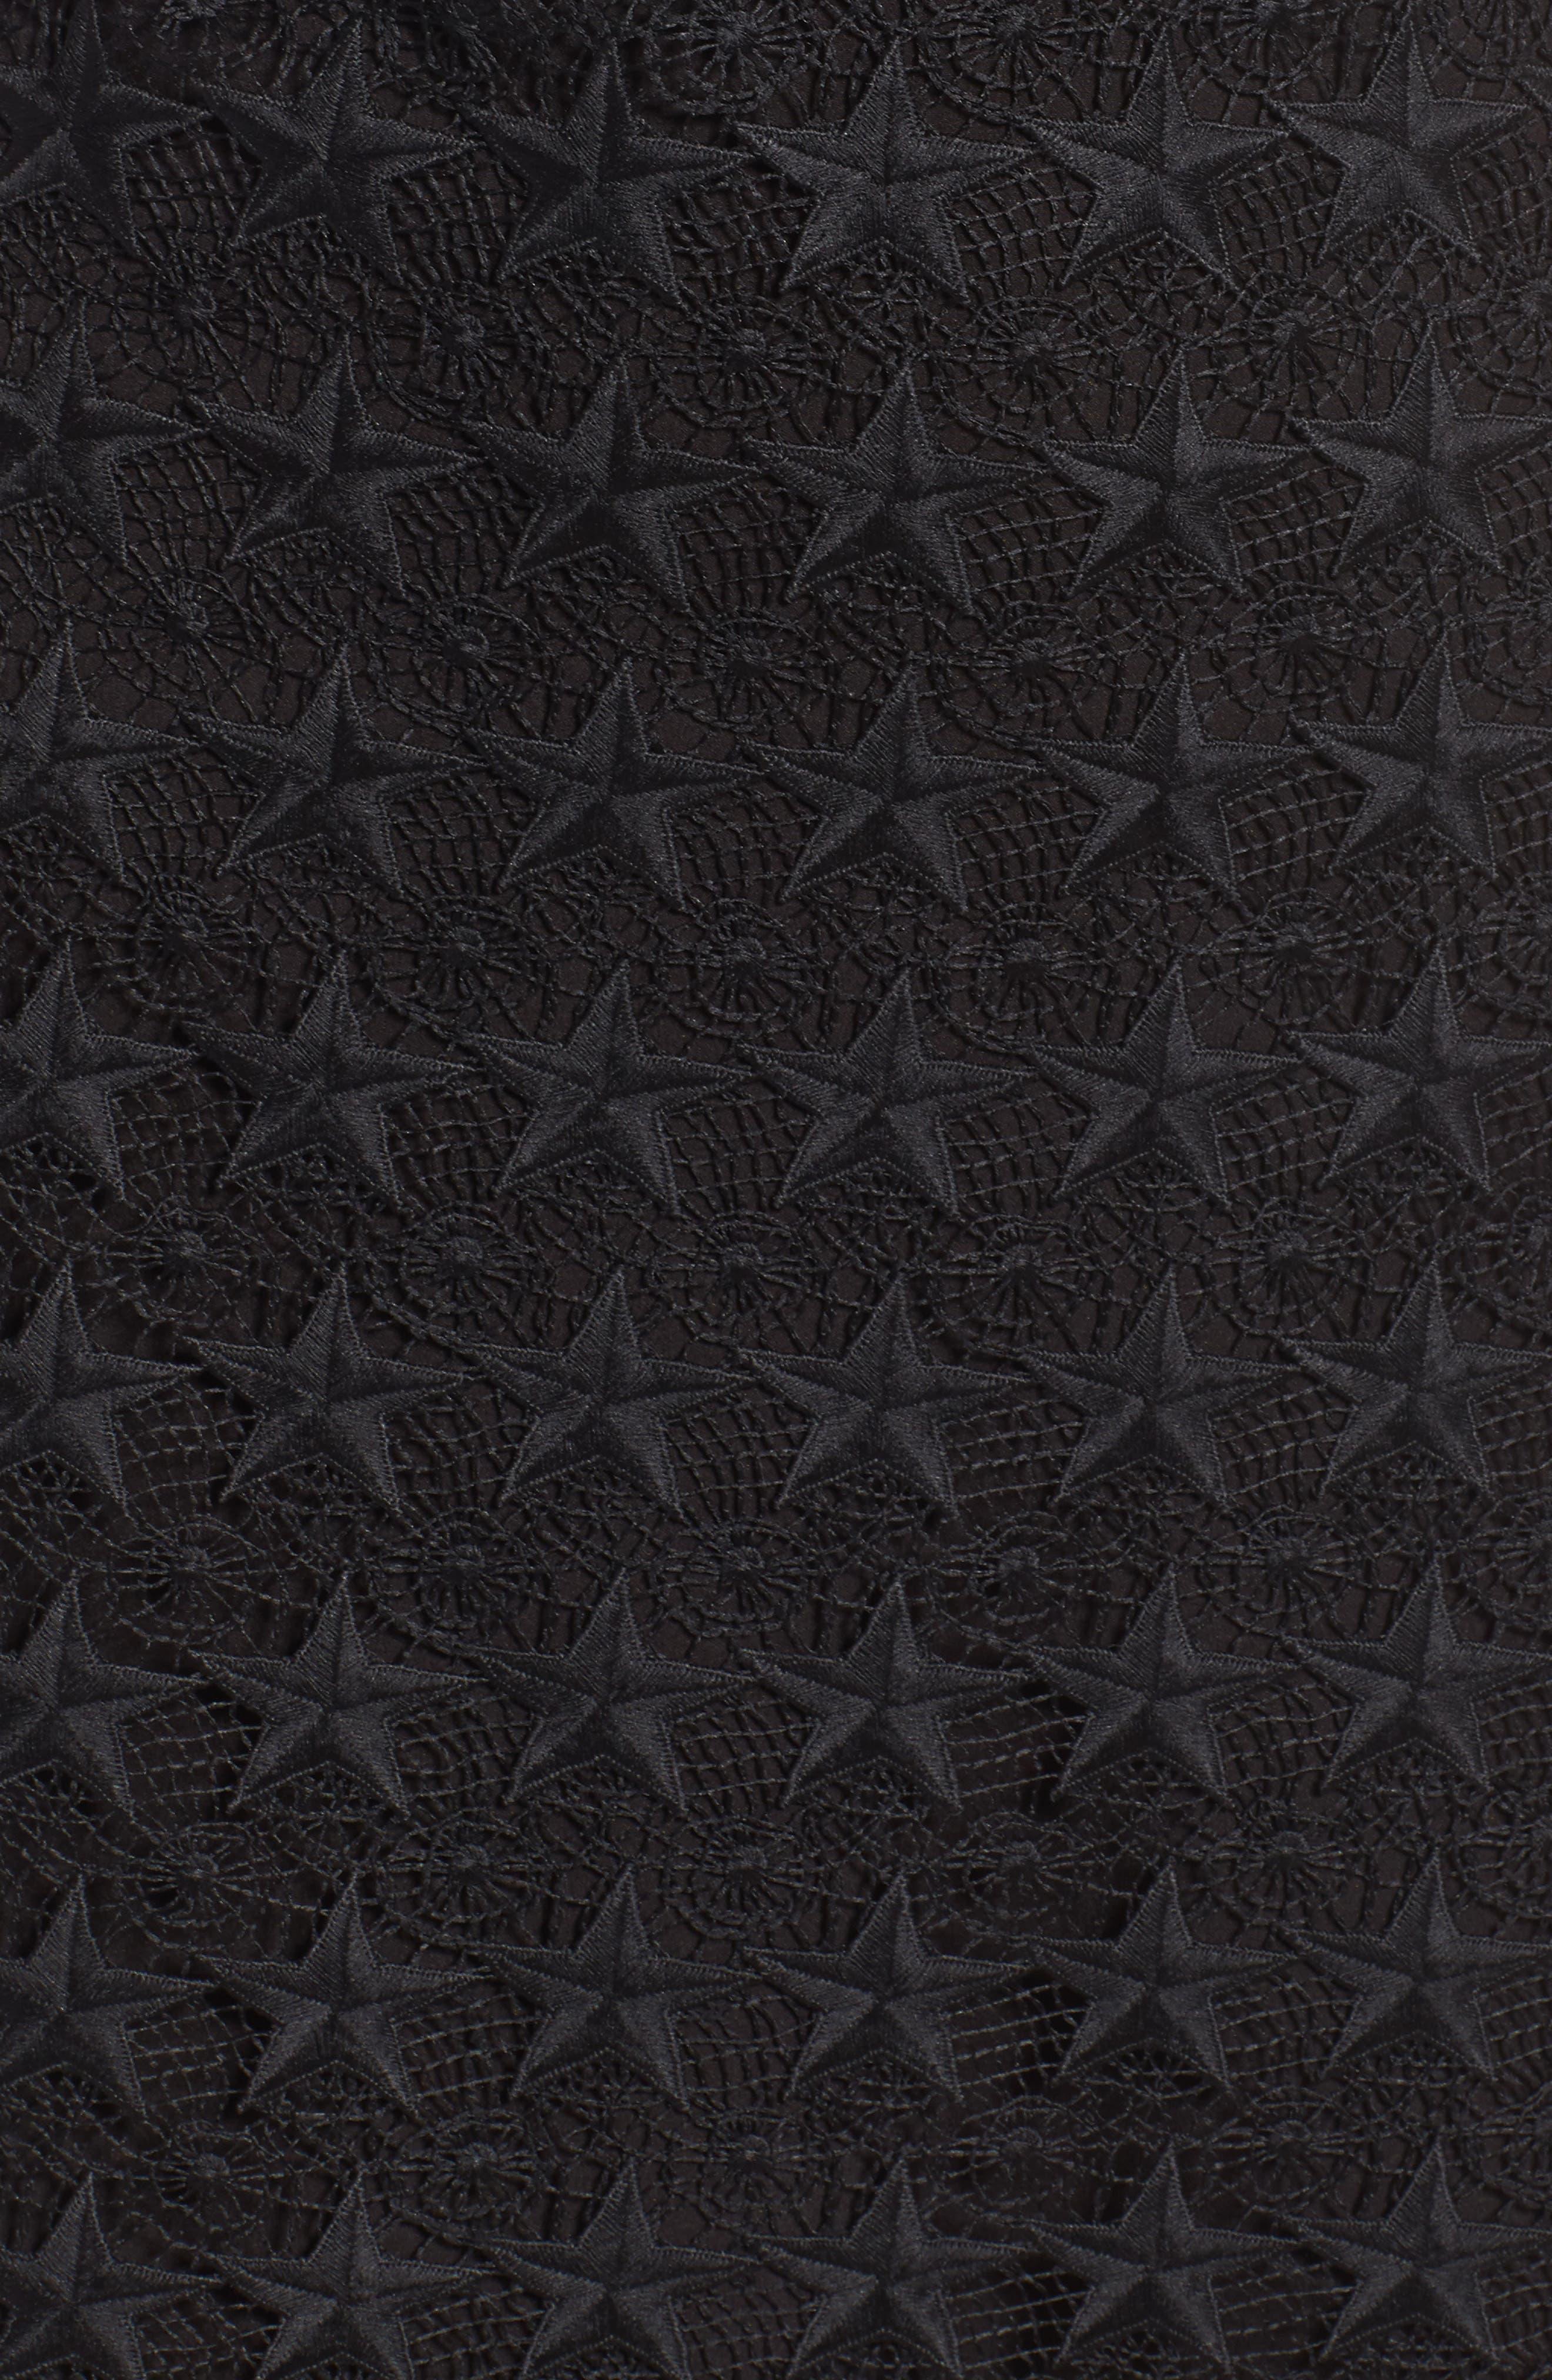 Star Lace Sheath Dress,                             Alternate thumbnail 5, color,